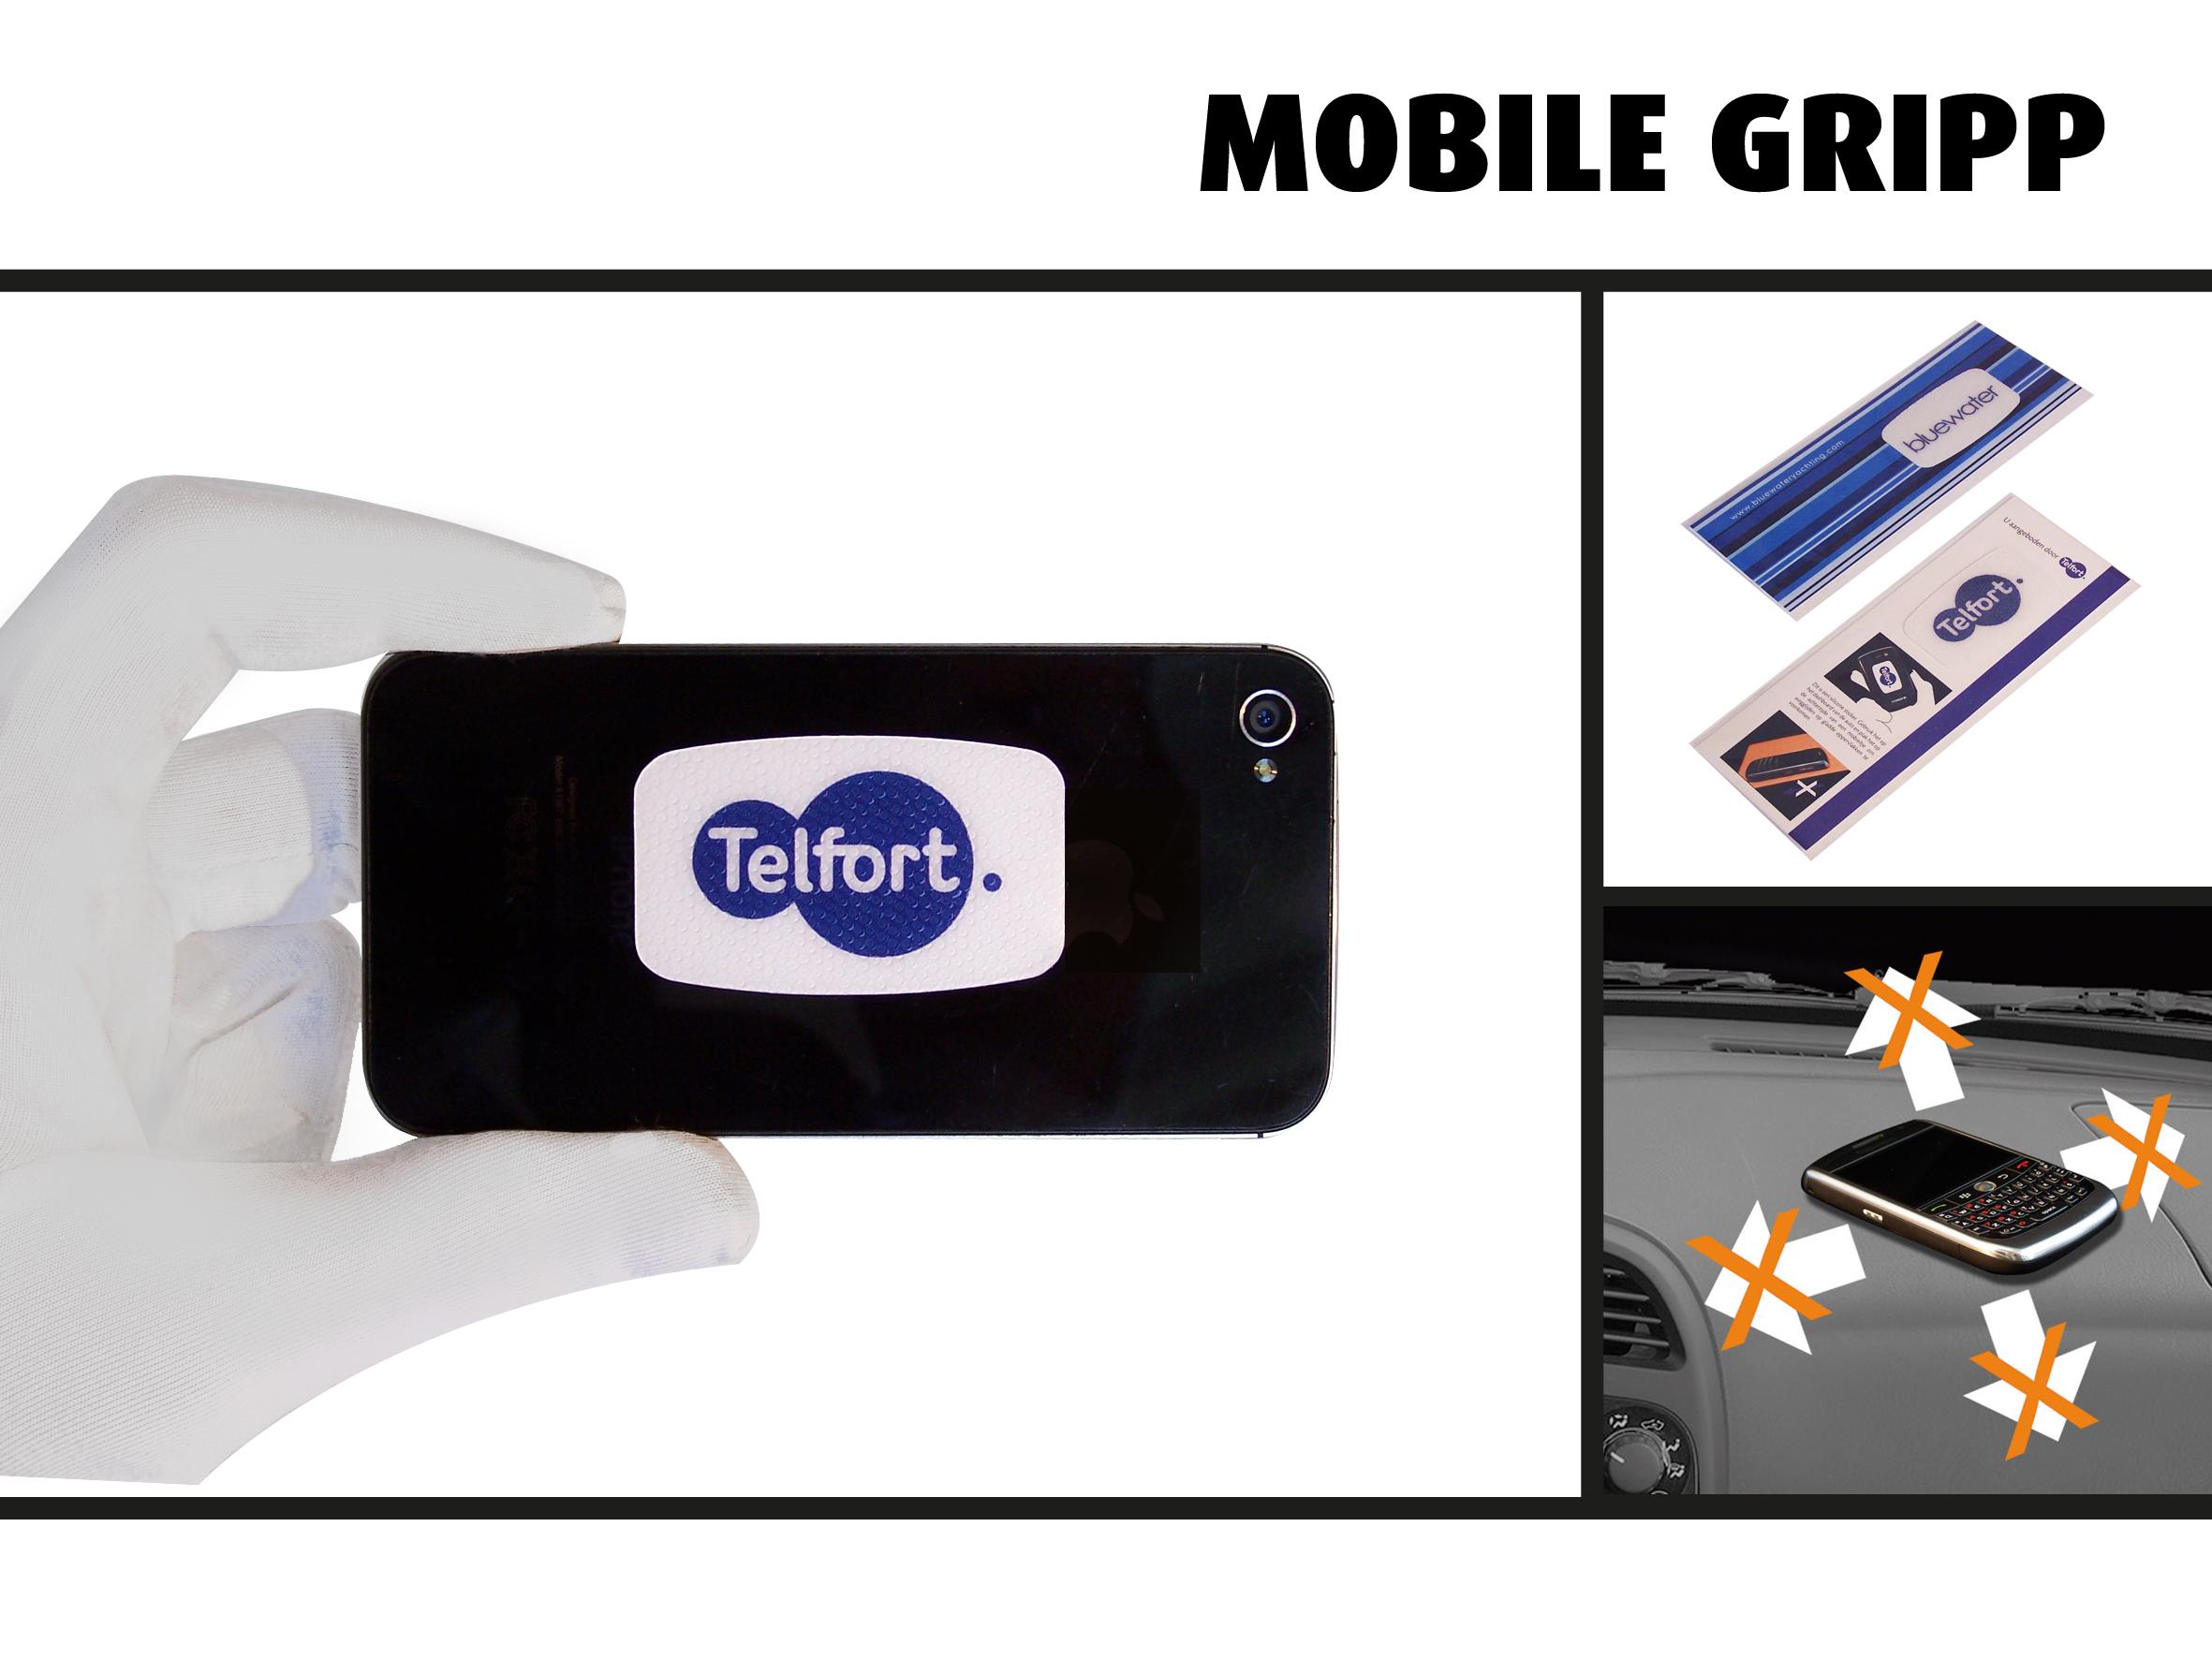 MOBILE GRIPP